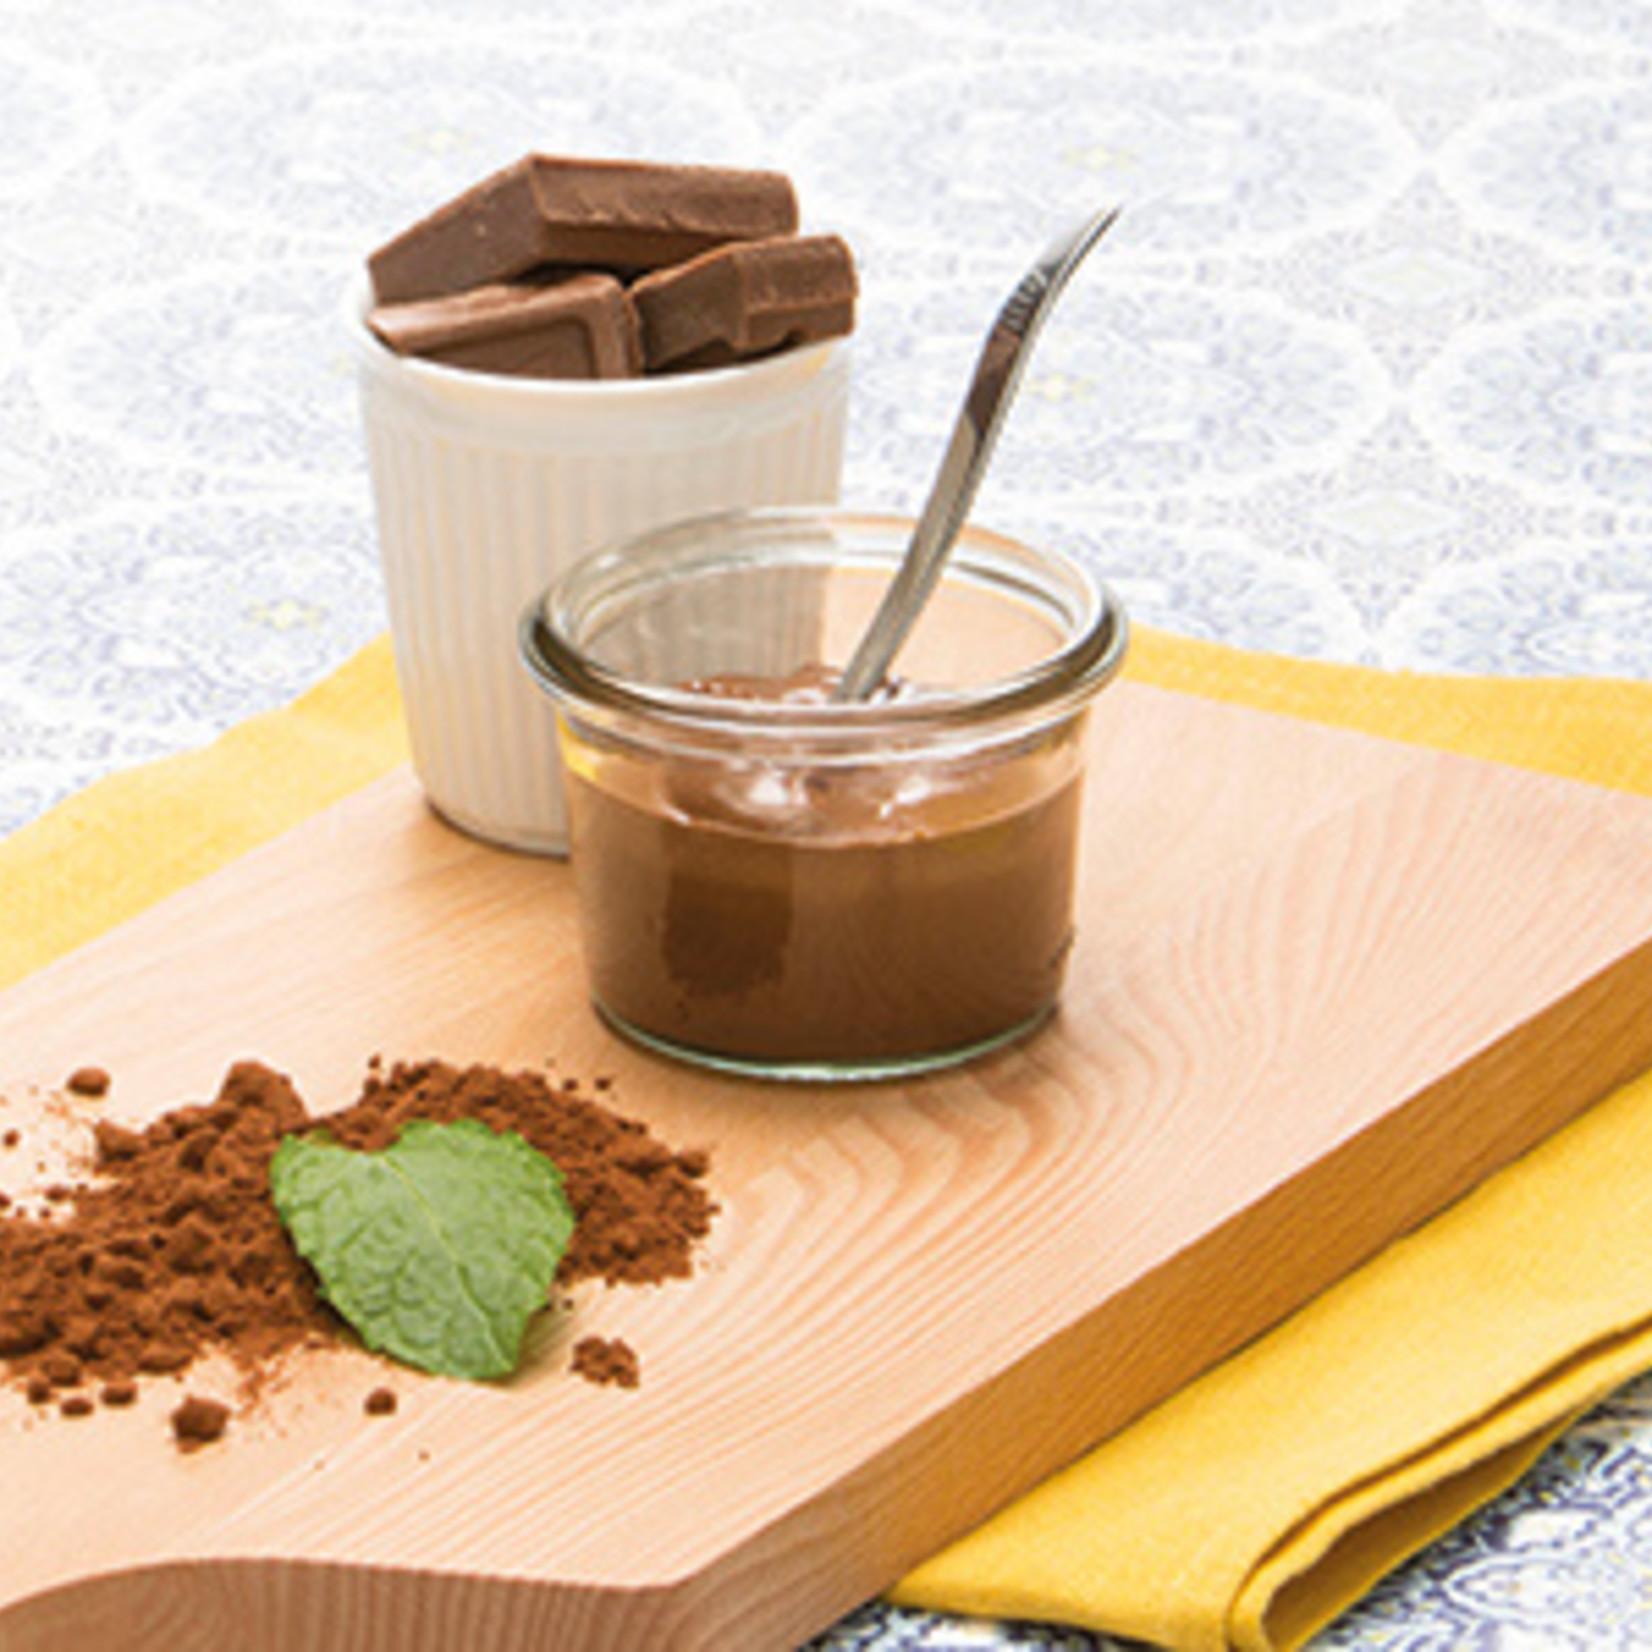 Powerslim PS08009-V1 chocolade hazelnoootpasta